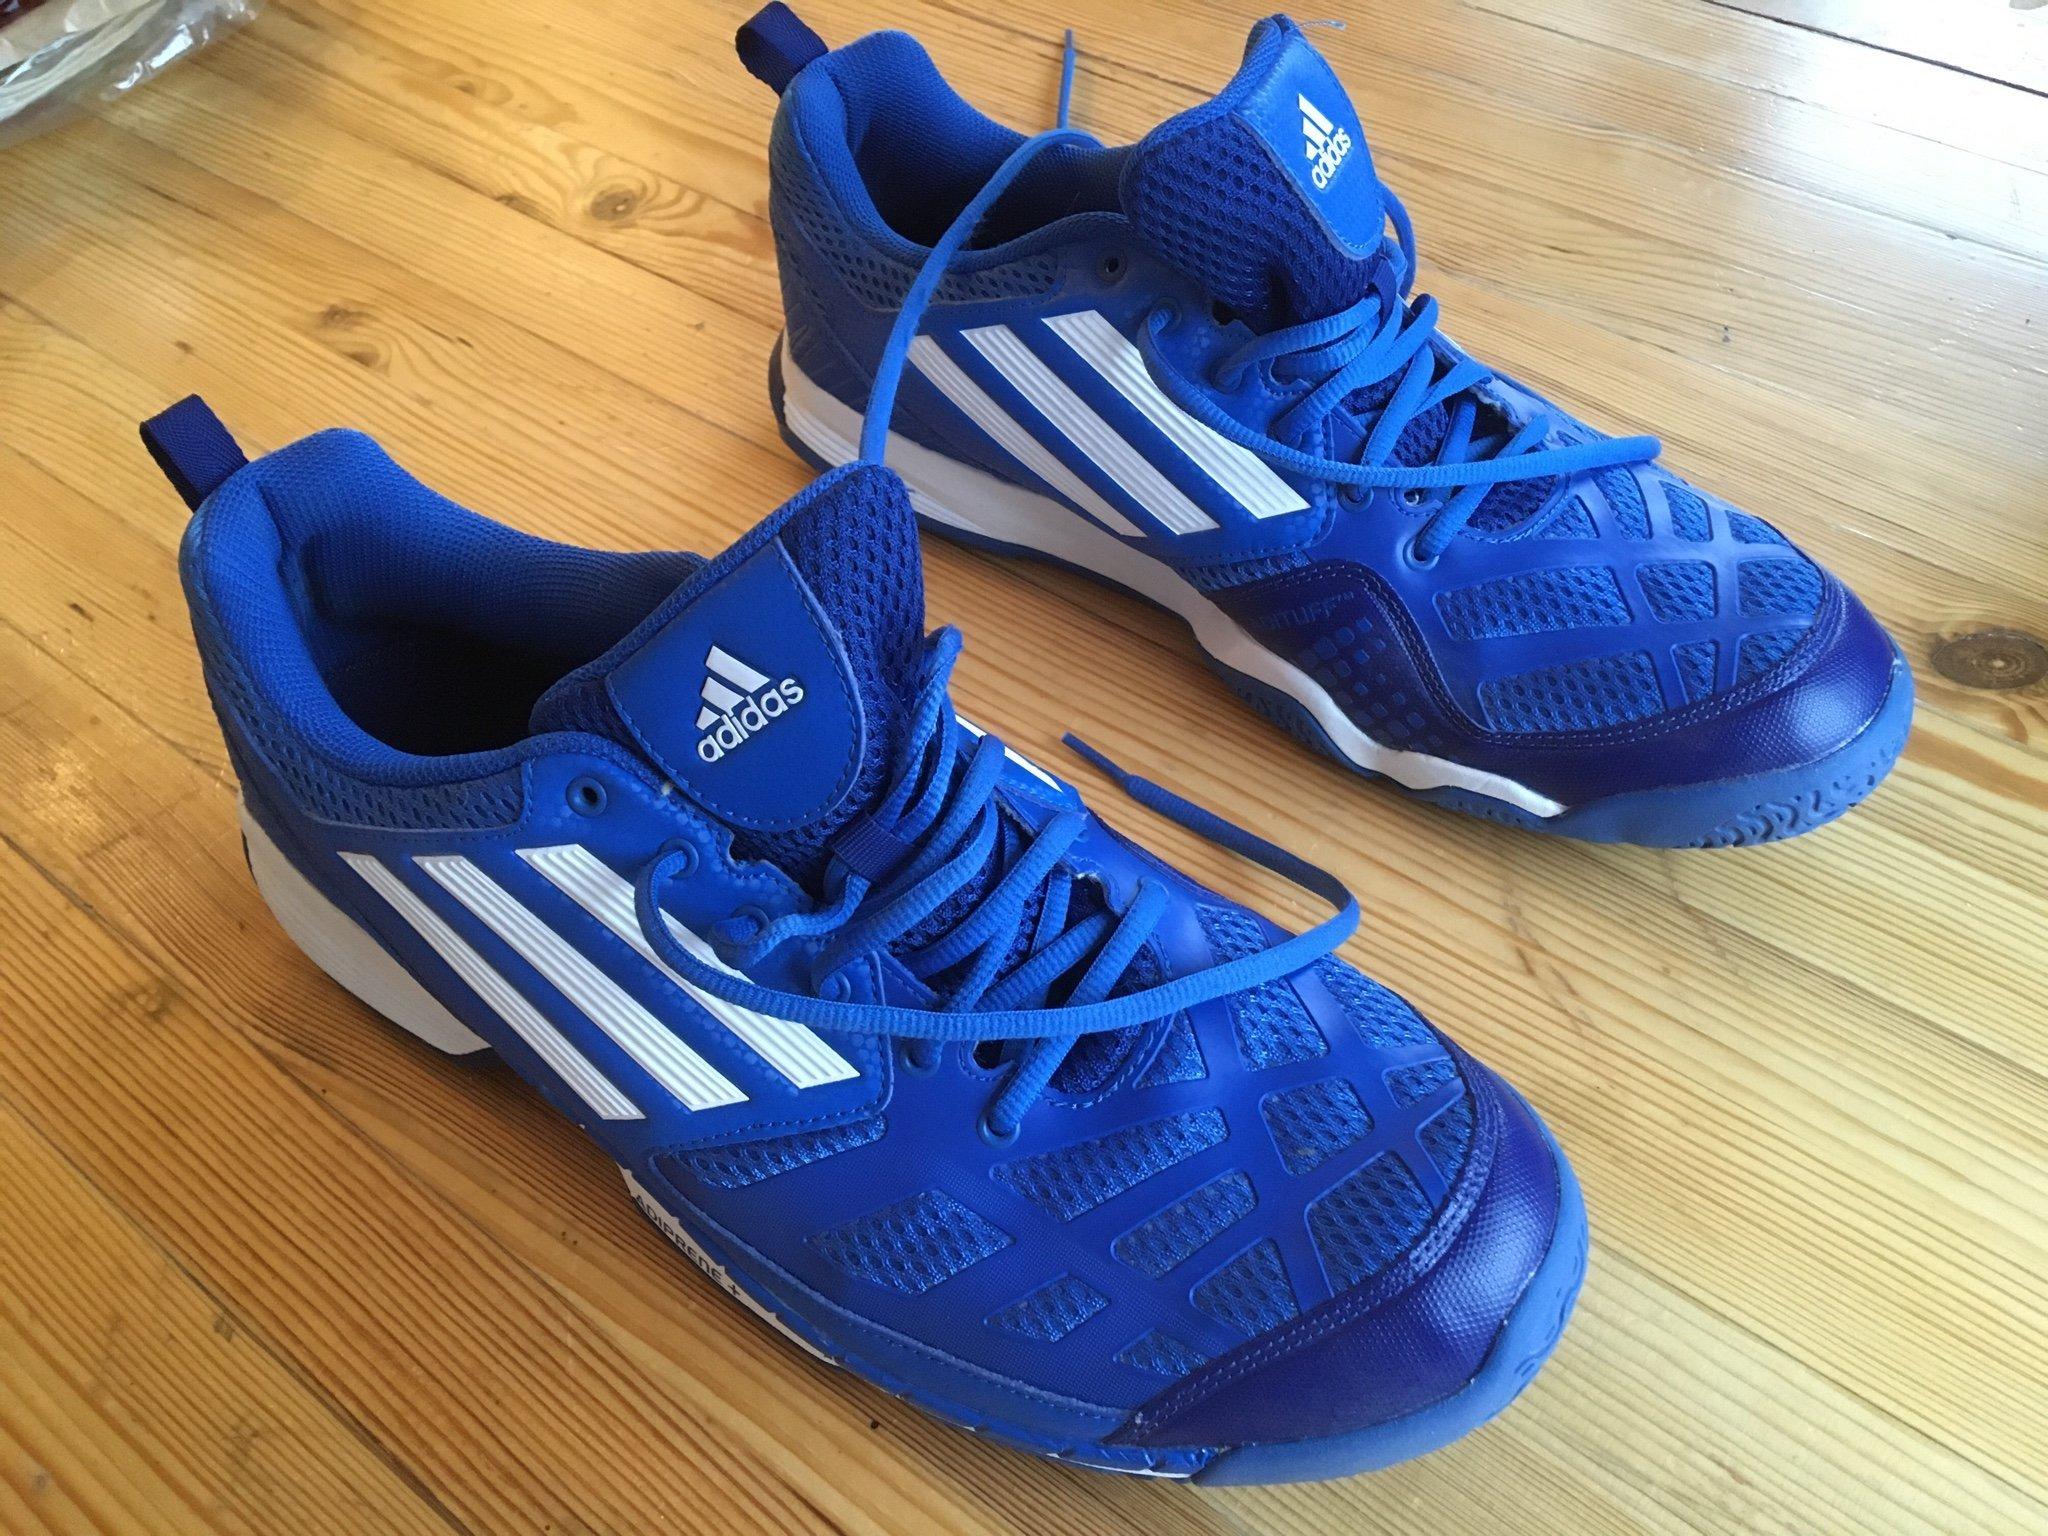 Fina Adidas skor Adiprene + Motionsskor US 12 12 UK 12